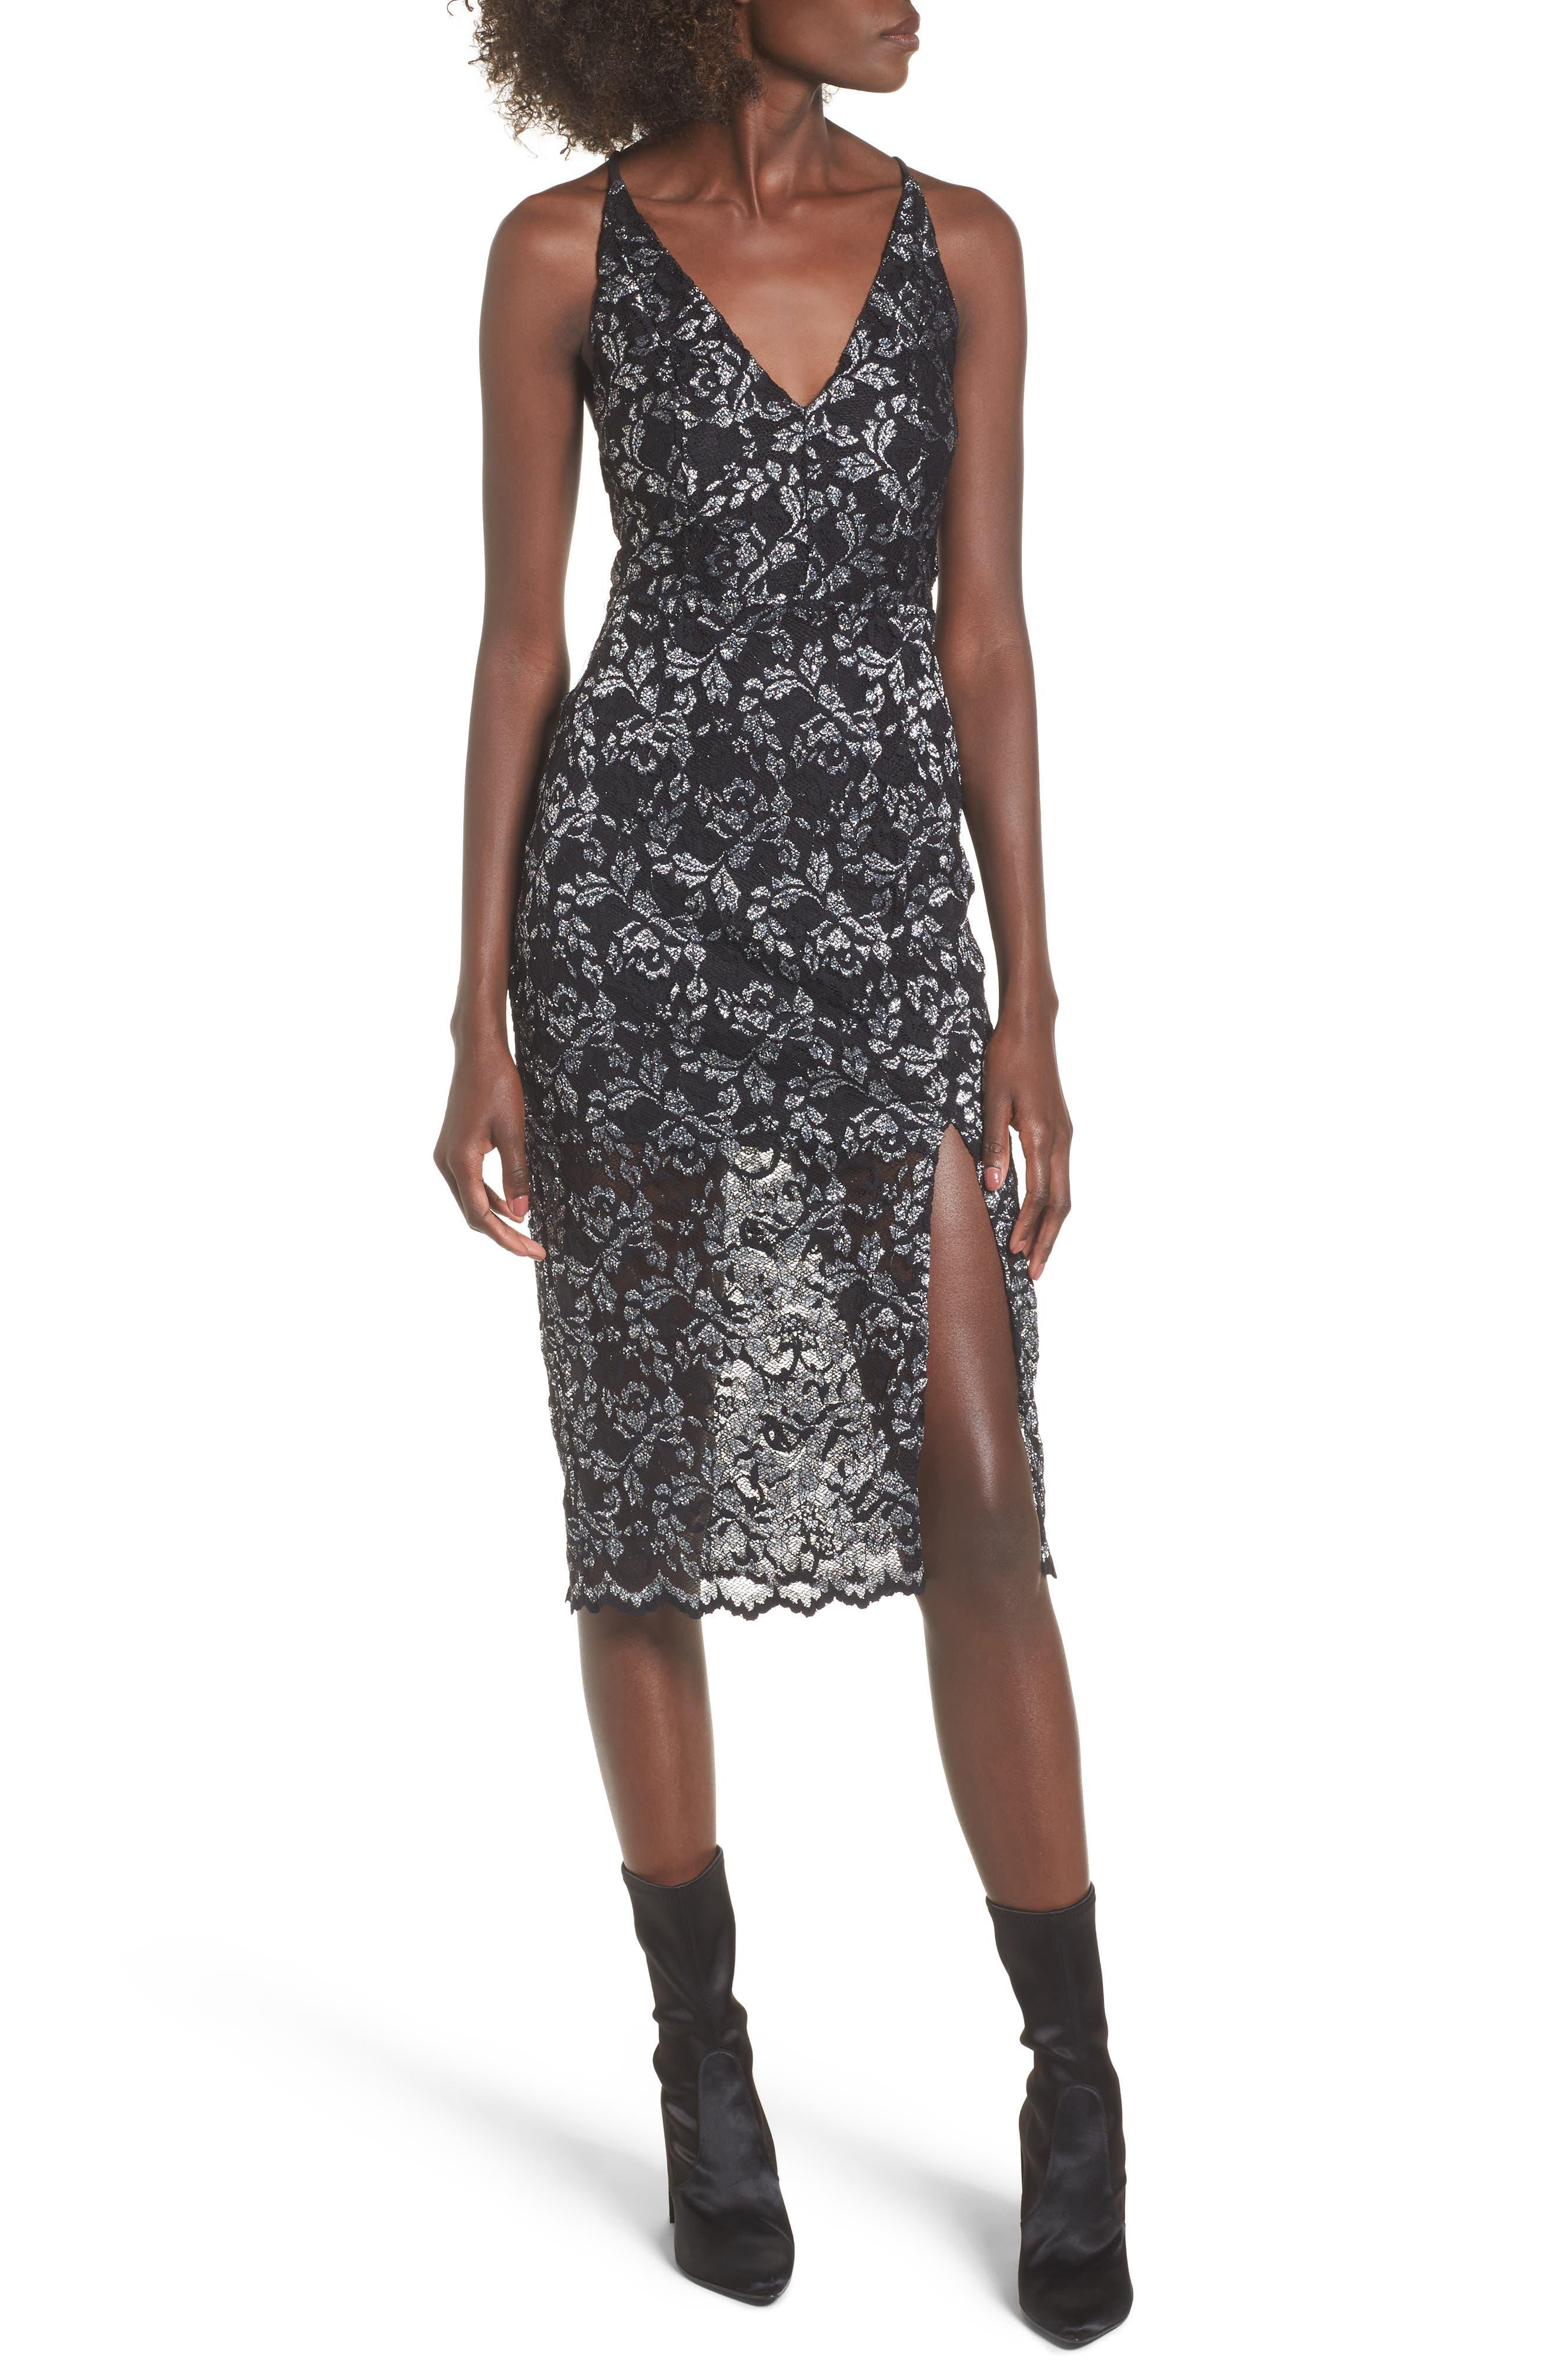 Alternate Image 1 Selected - NBD Sitabella Lace Dress